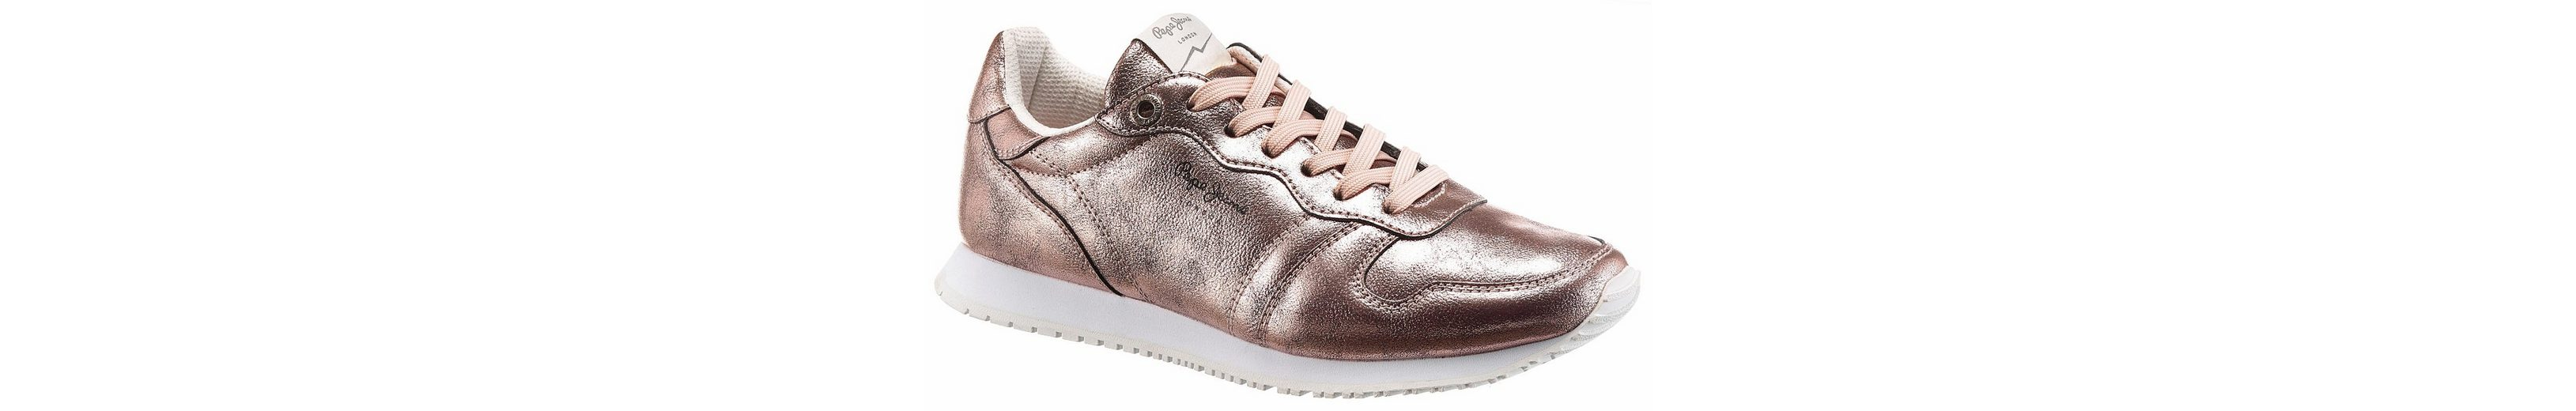 Pepe Jeans Gable Plain Sneaker, im trendigen Metallic-Look